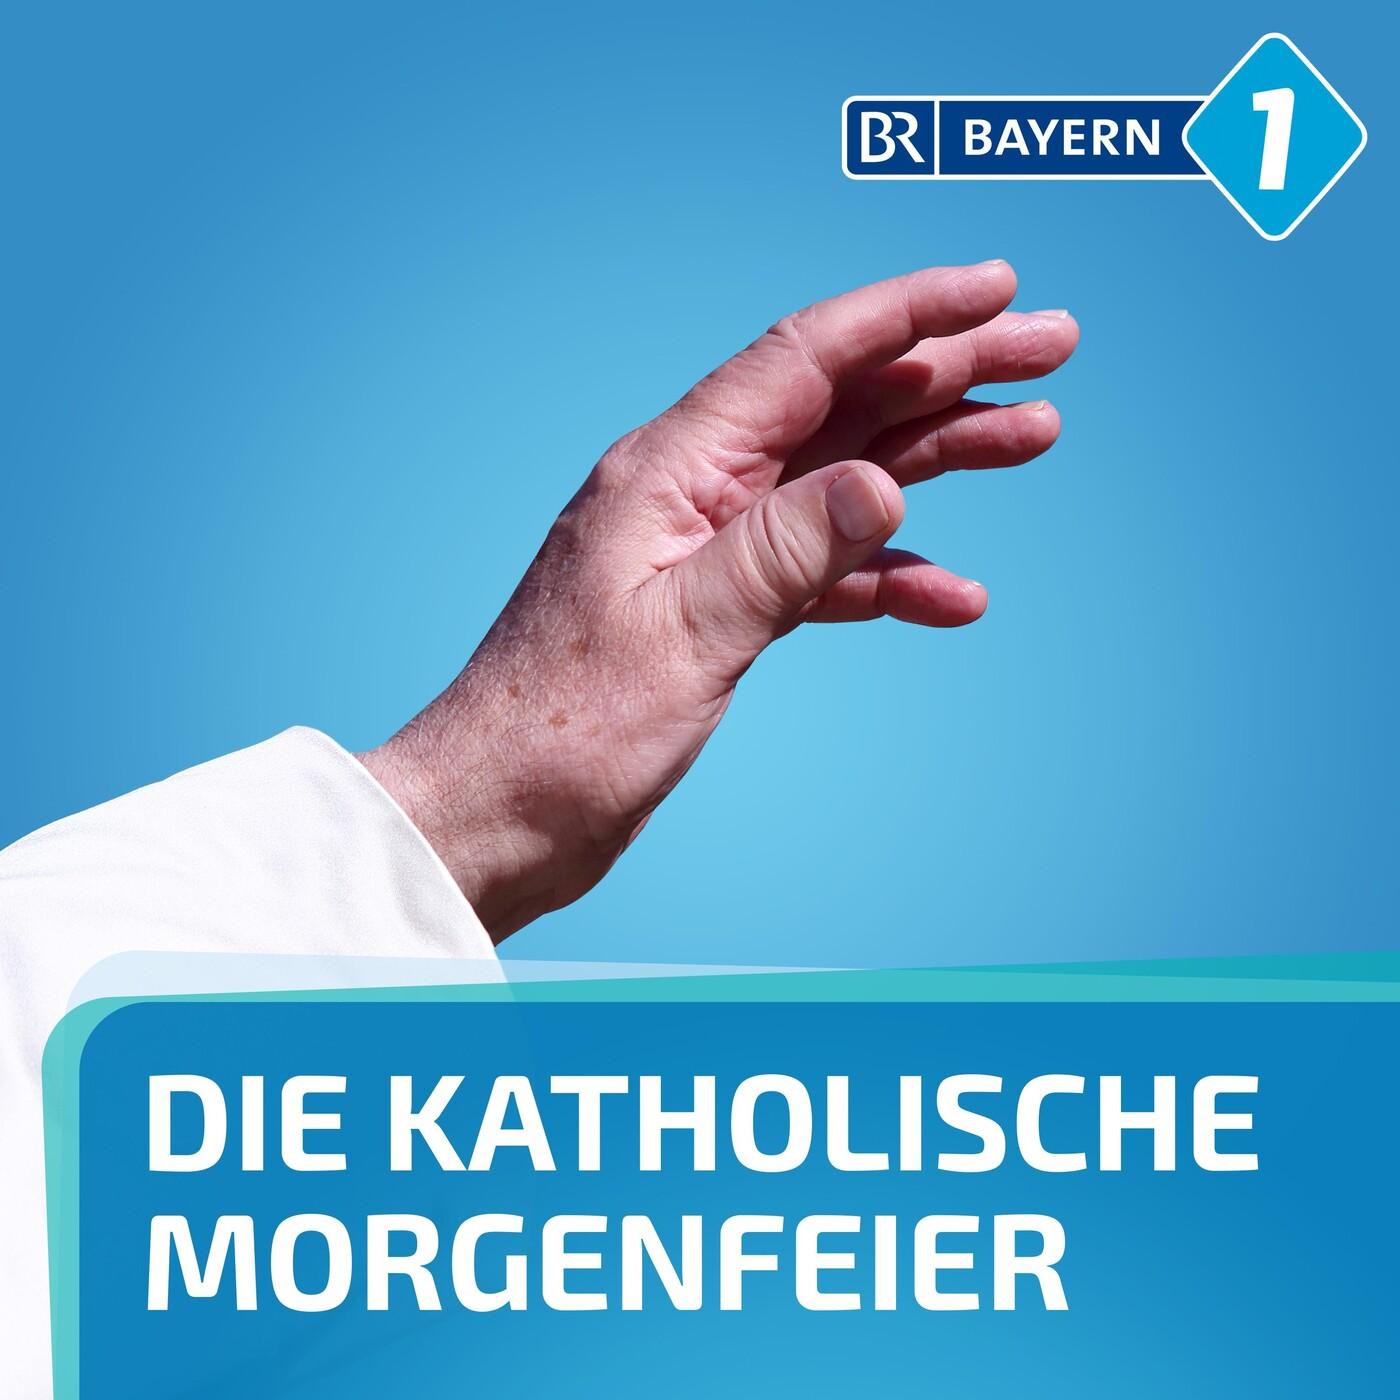 Bayern 1 Morgenfeier